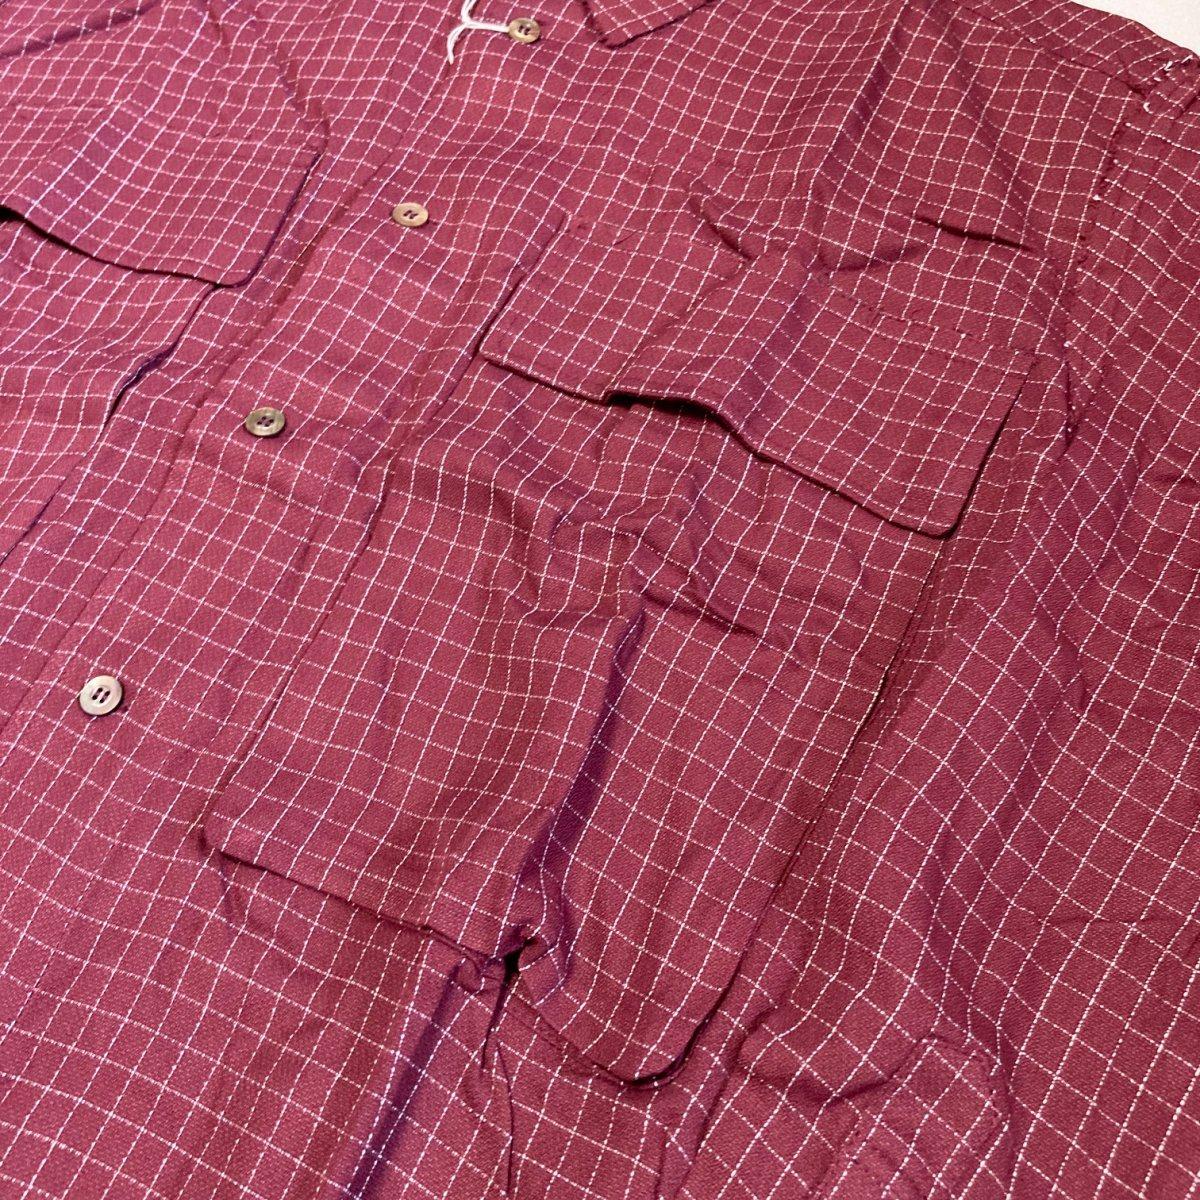 <img class='new_mark_img1' src='https://img.shop-pro.jp/img/new/icons3.gif' style='border:none;display:inline;margin:0px;padding:0px;width:auto;' />Black weirdos  ブラック ウィドー / シャツ Big Pocket Shirt